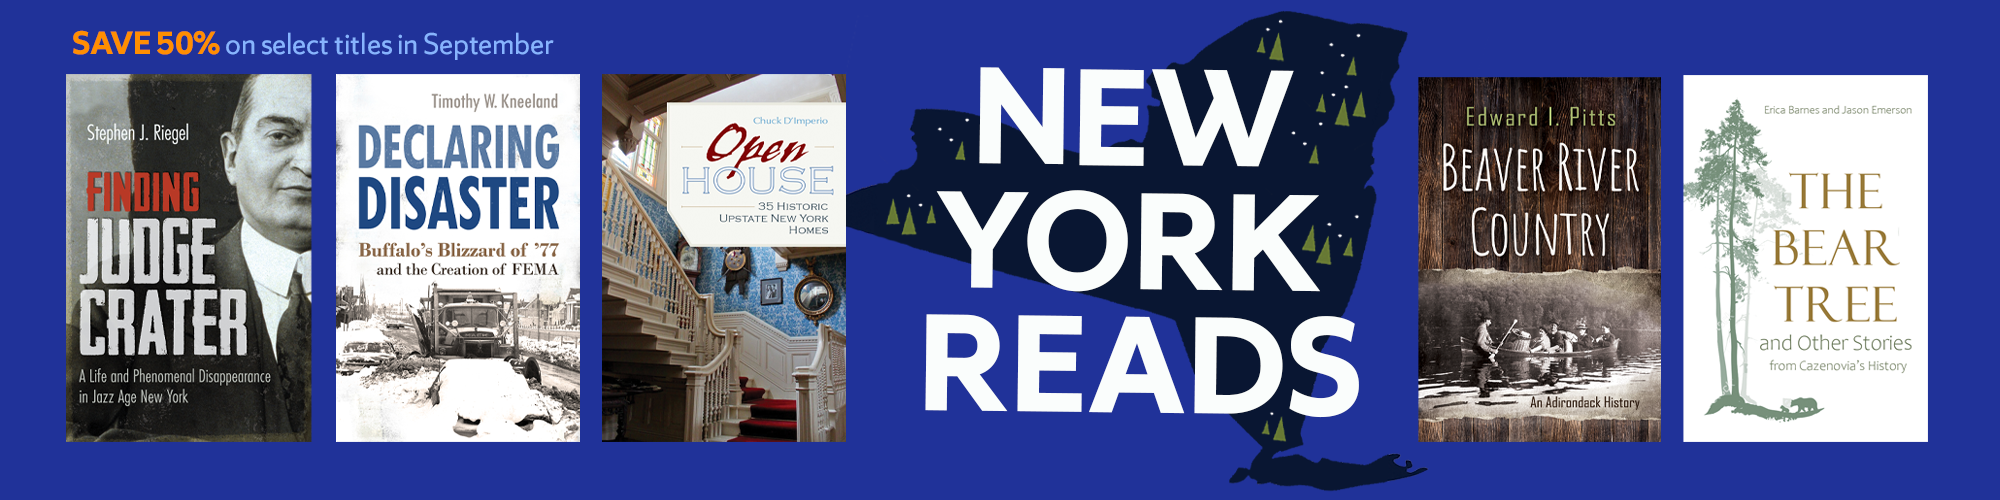 New York Reads